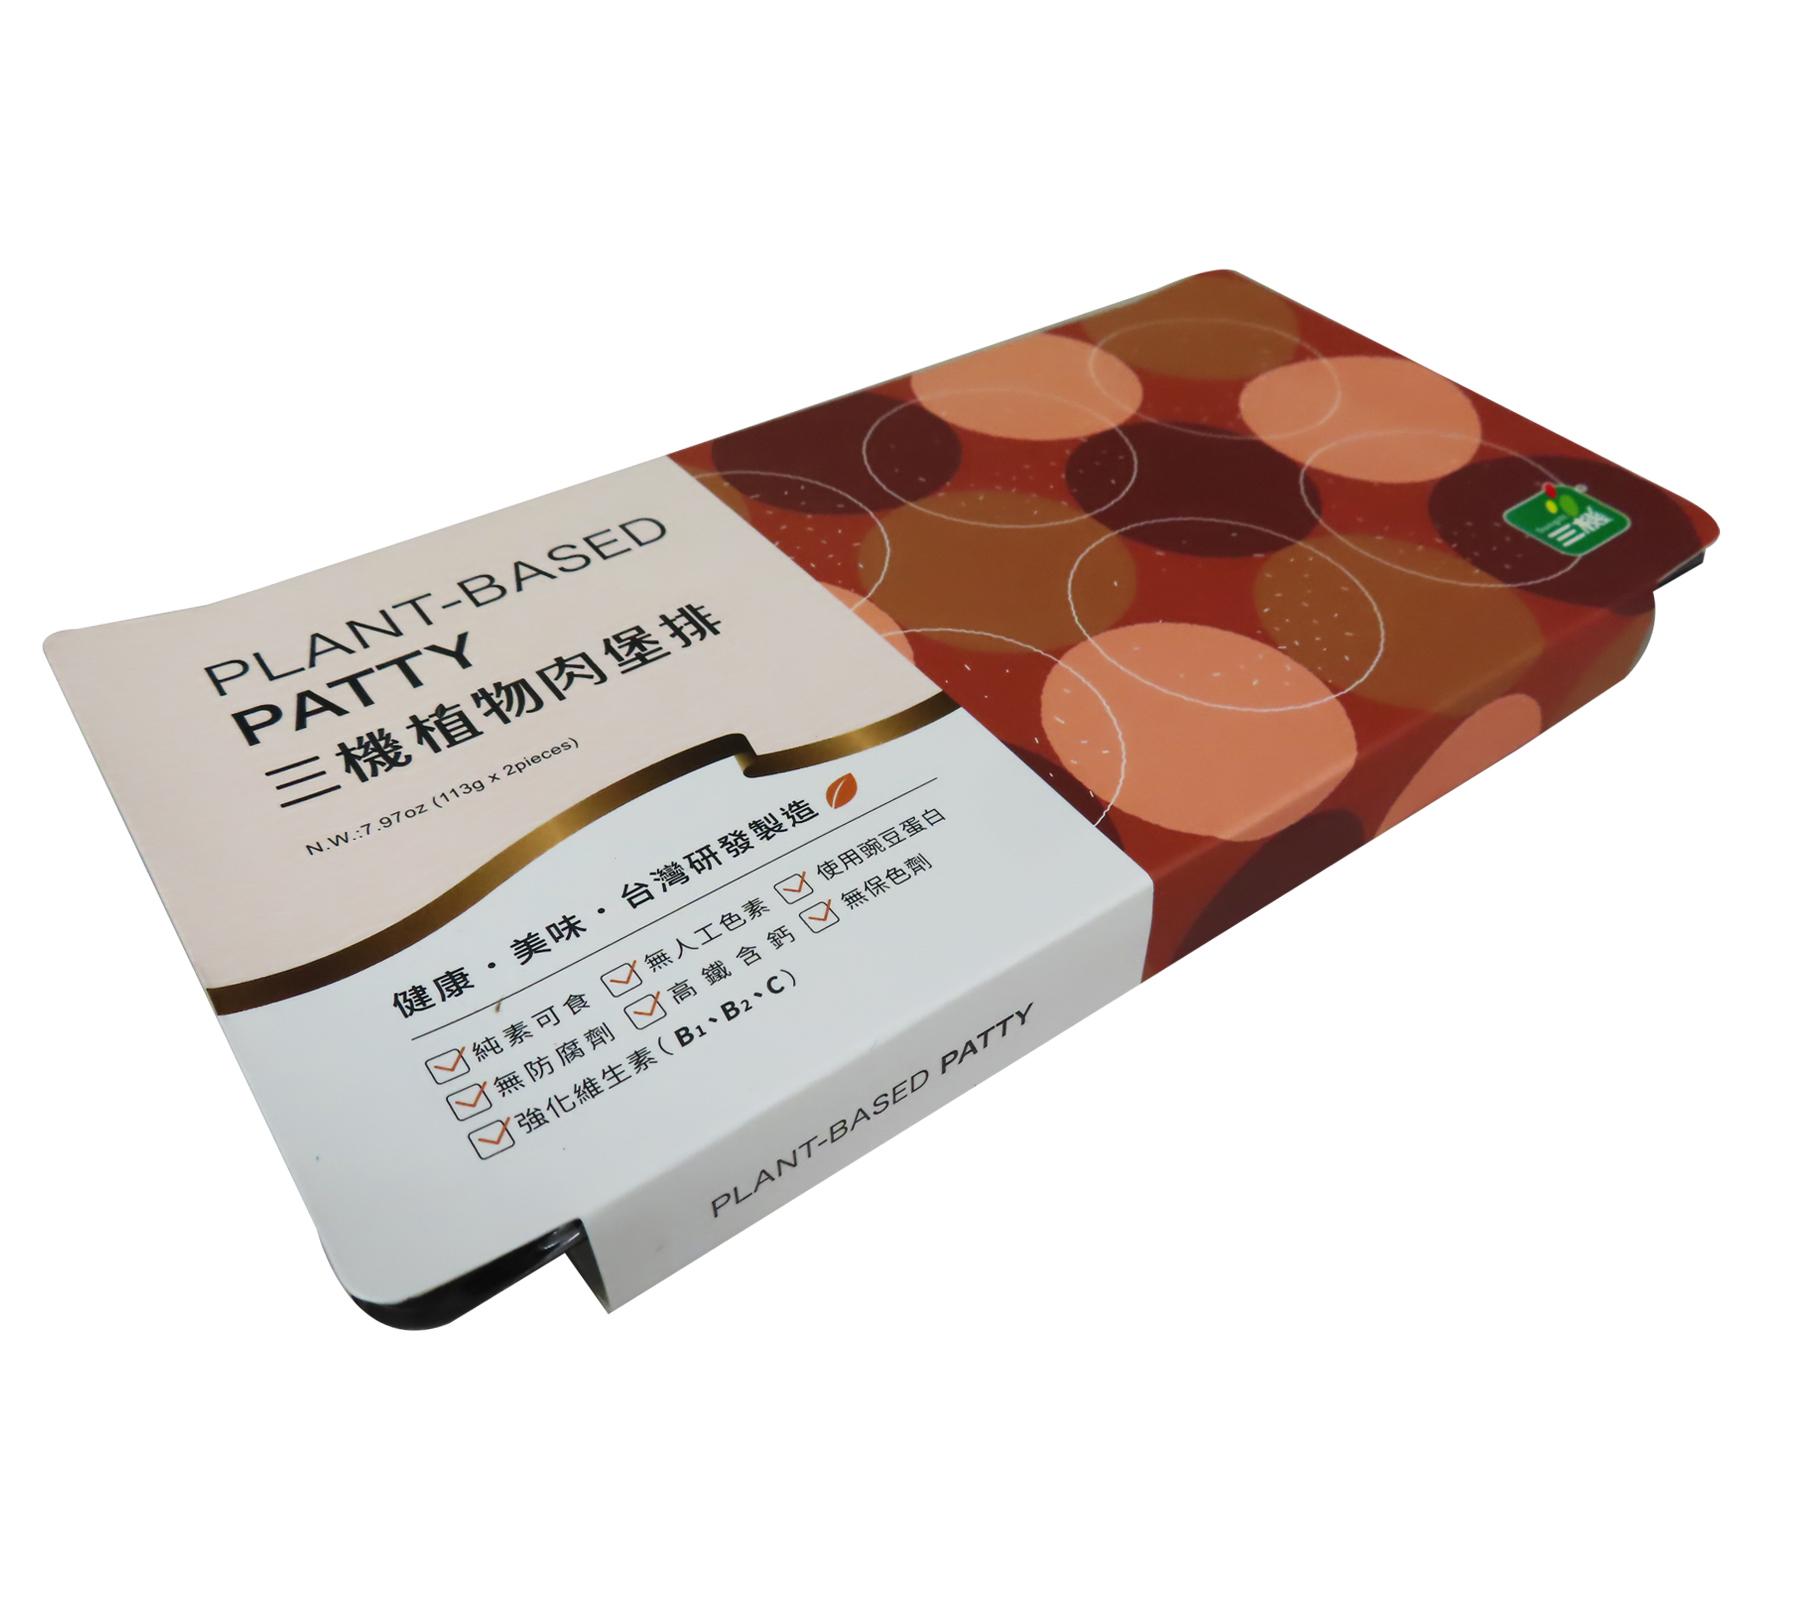 Image Sungift Plant - Based Patty 三机植物肉堡排 (2 片)226grams